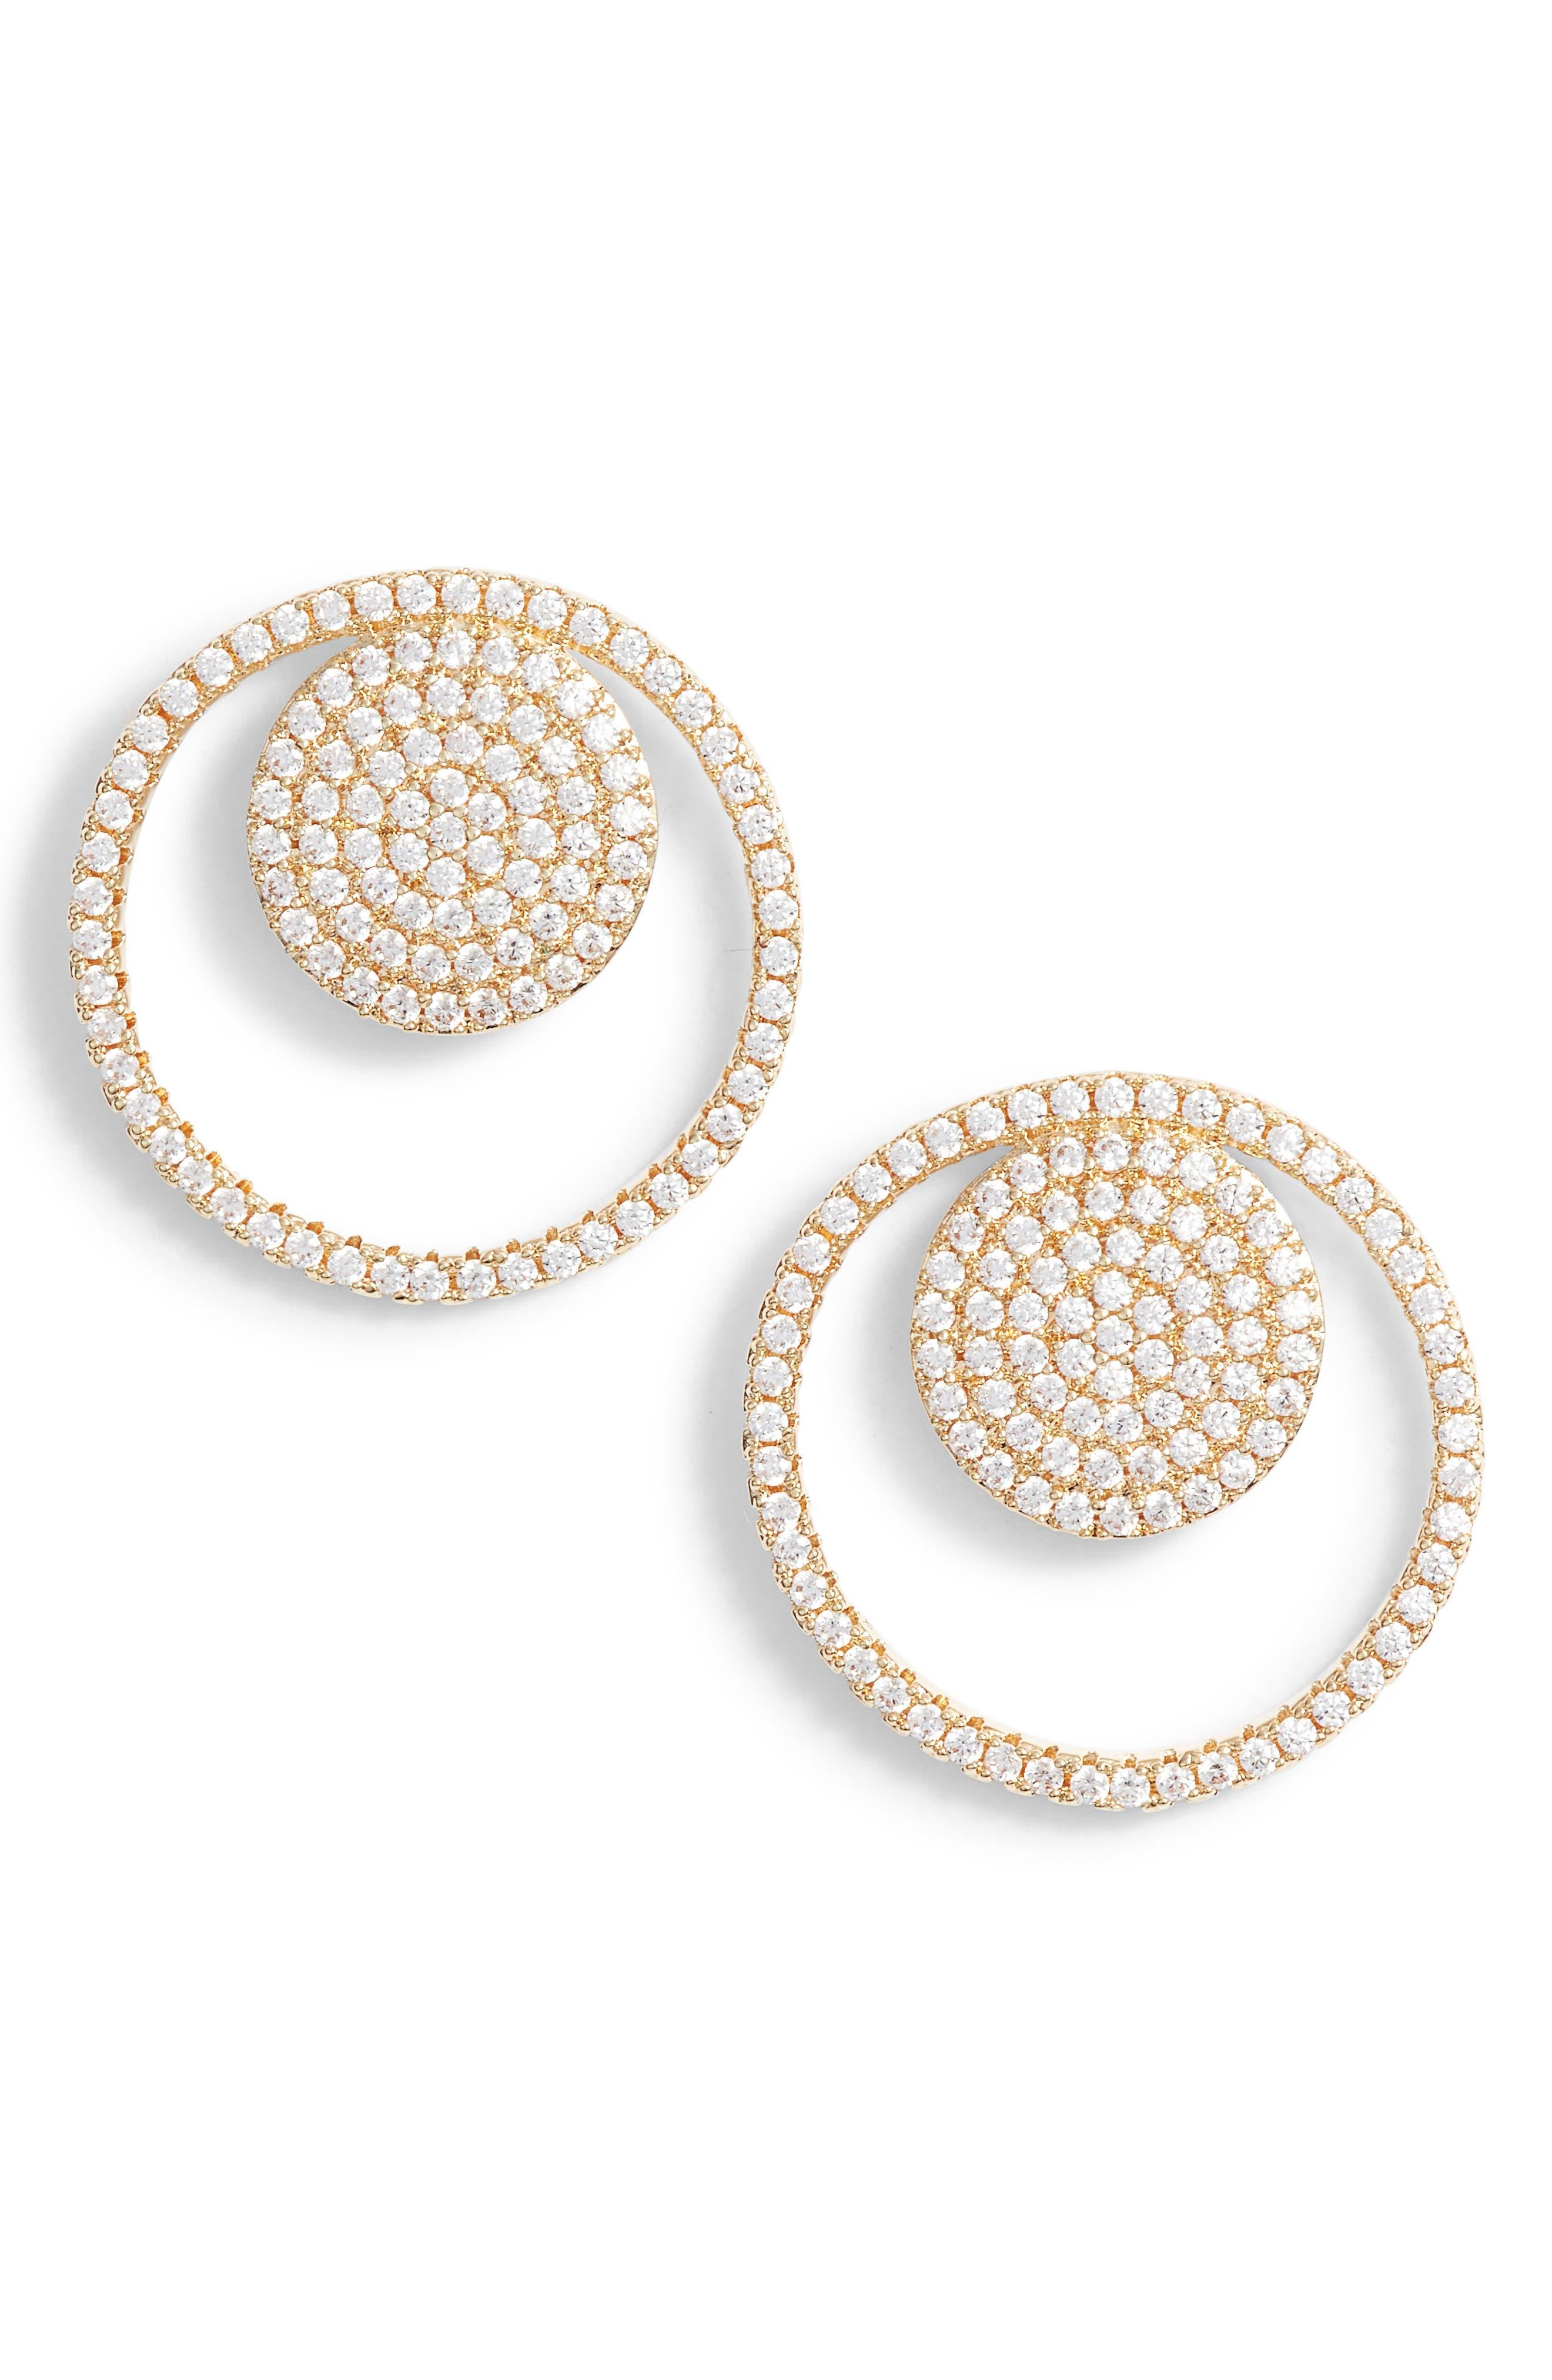 Pavé Spheres Frontal Hoop Earrings,                             Main thumbnail 1, color,                             CLEAR/ GOLD